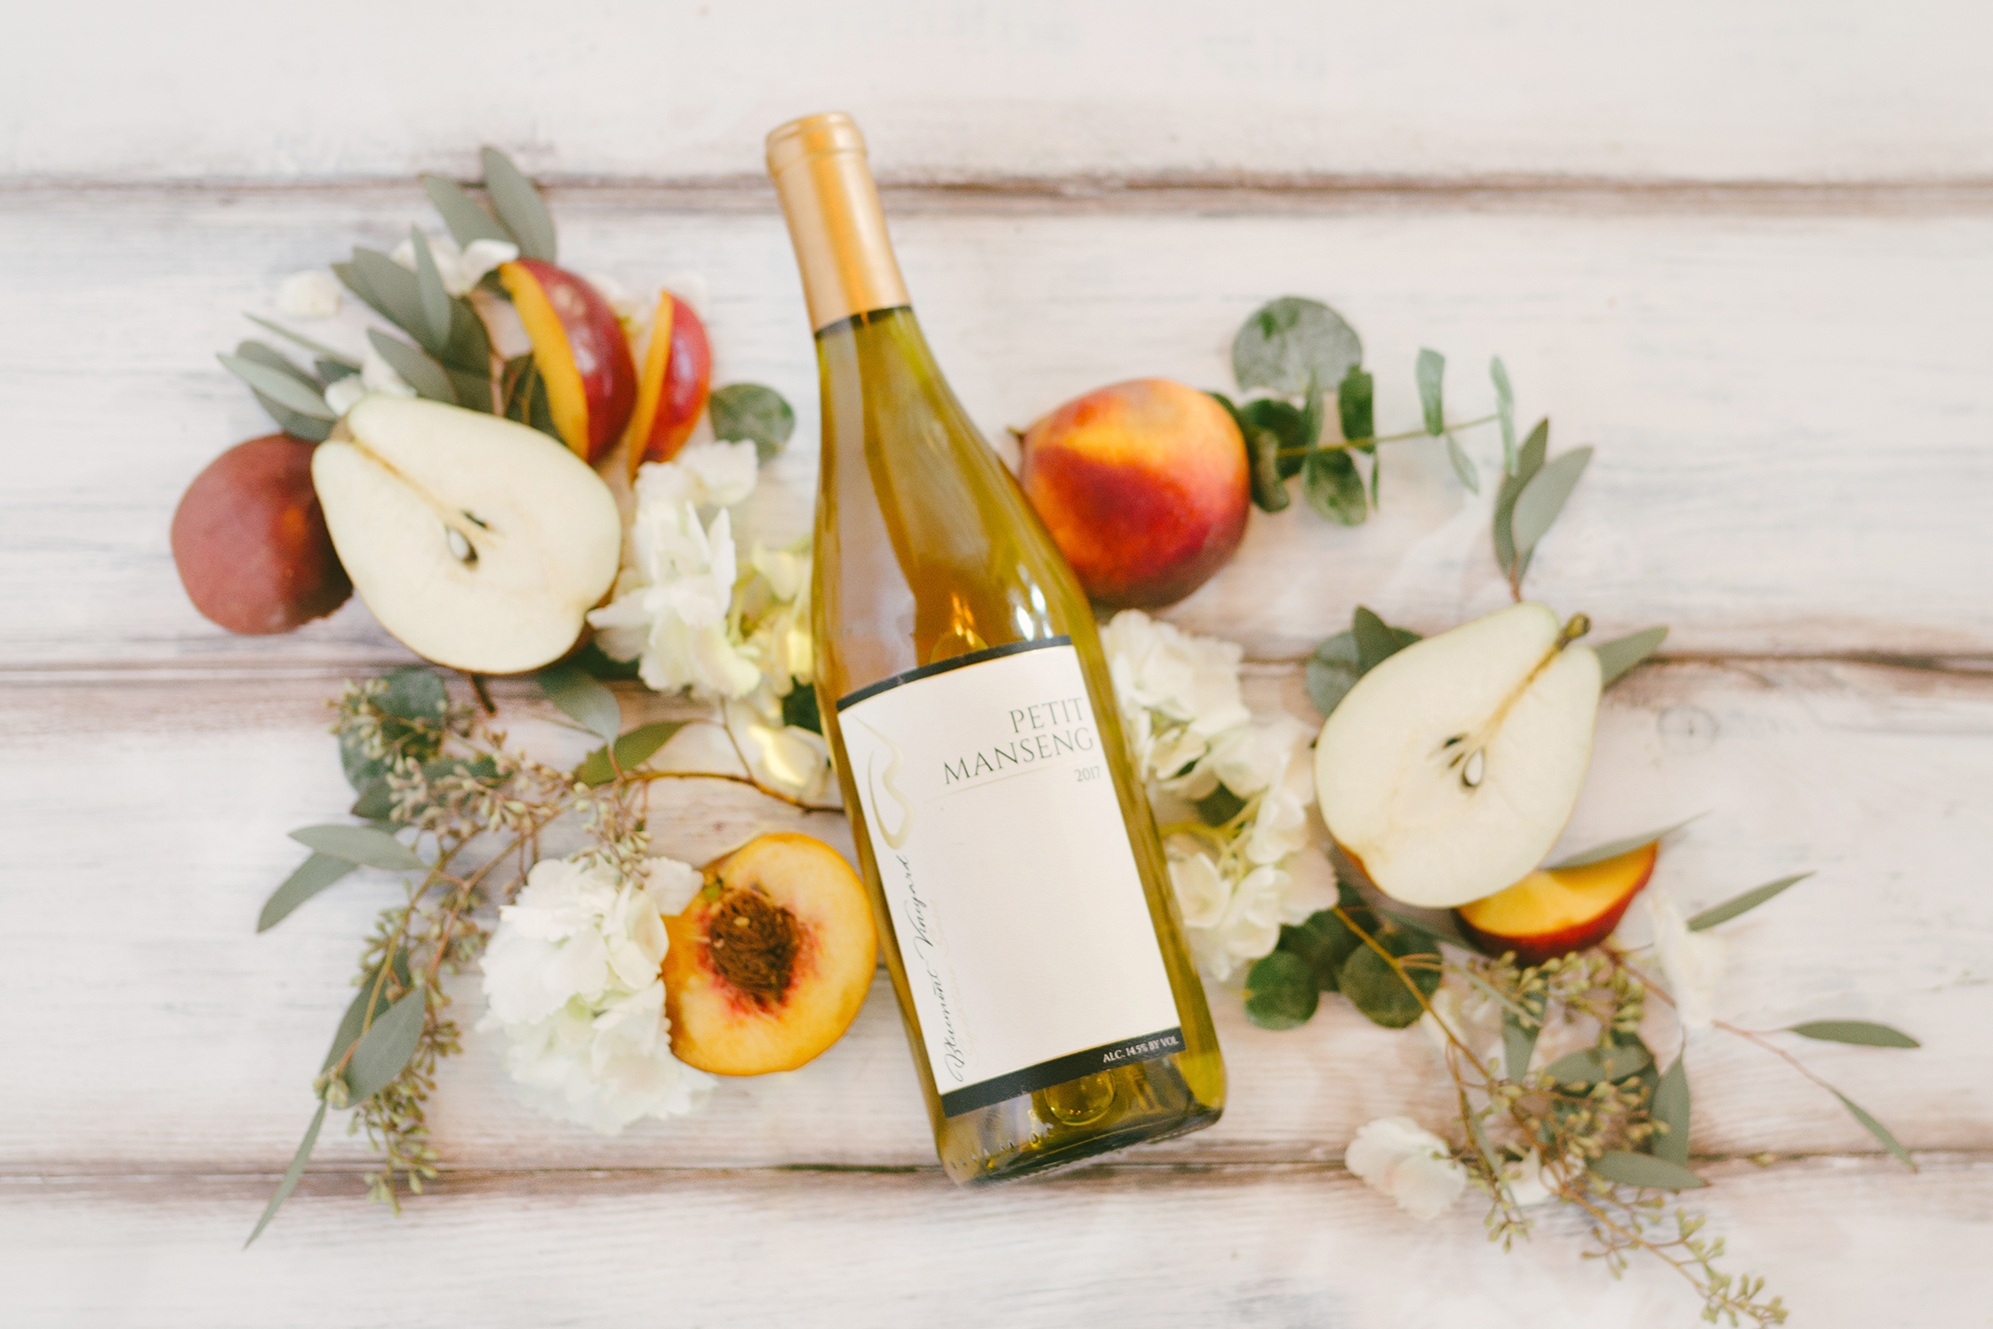 bluemont-vineyard-our-wines-signature-series-2017-petit-manseng-9412.jpg